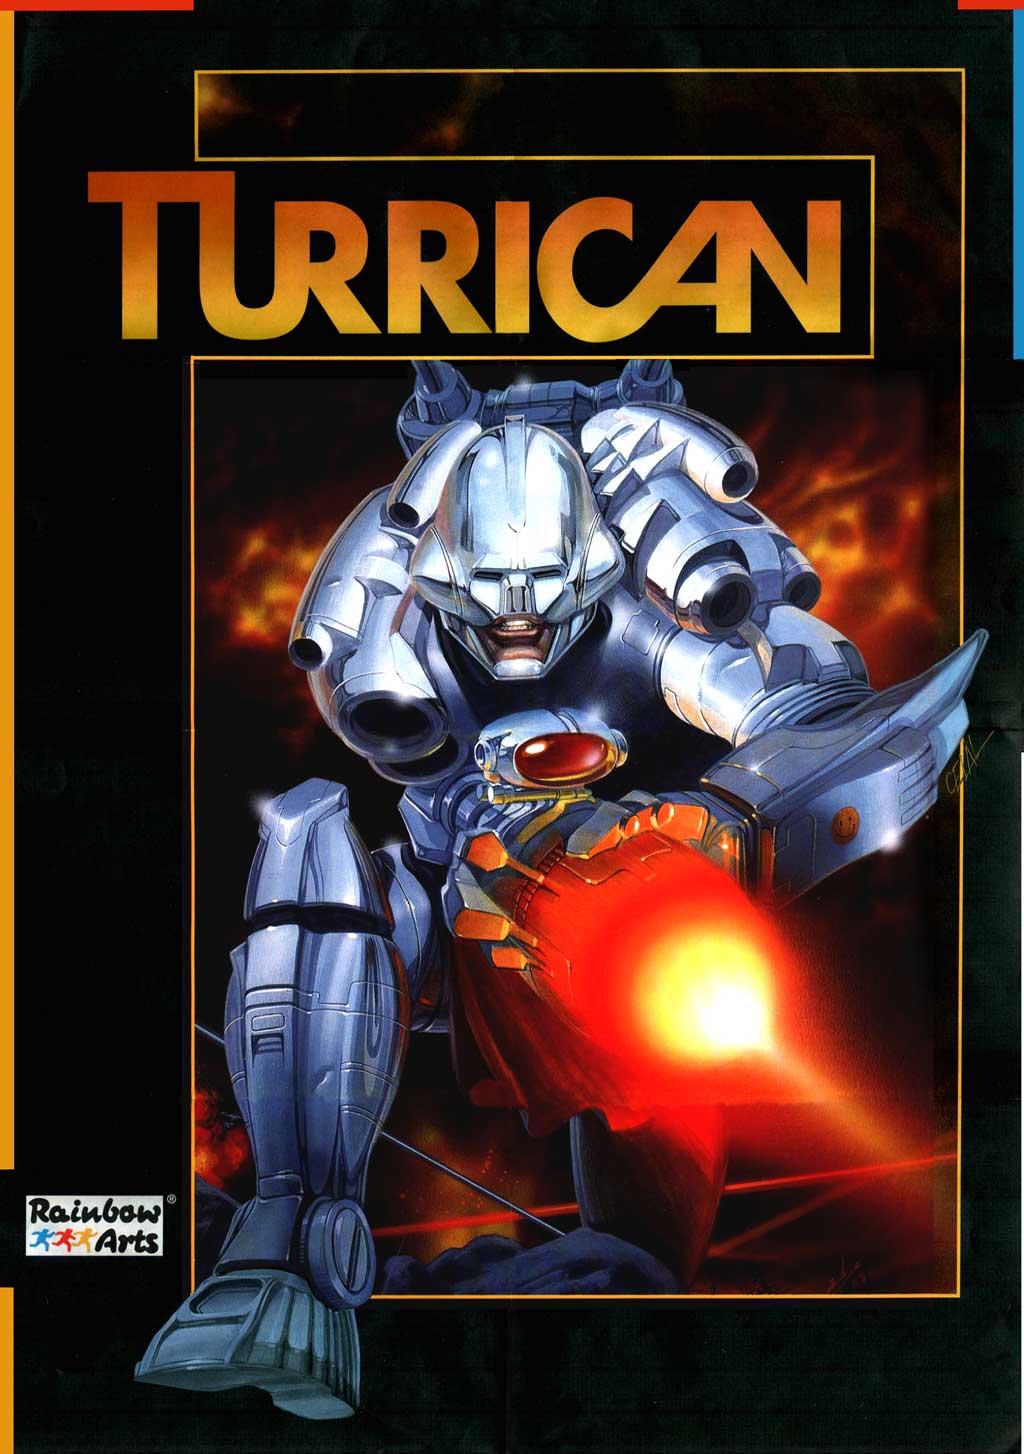 turrican1